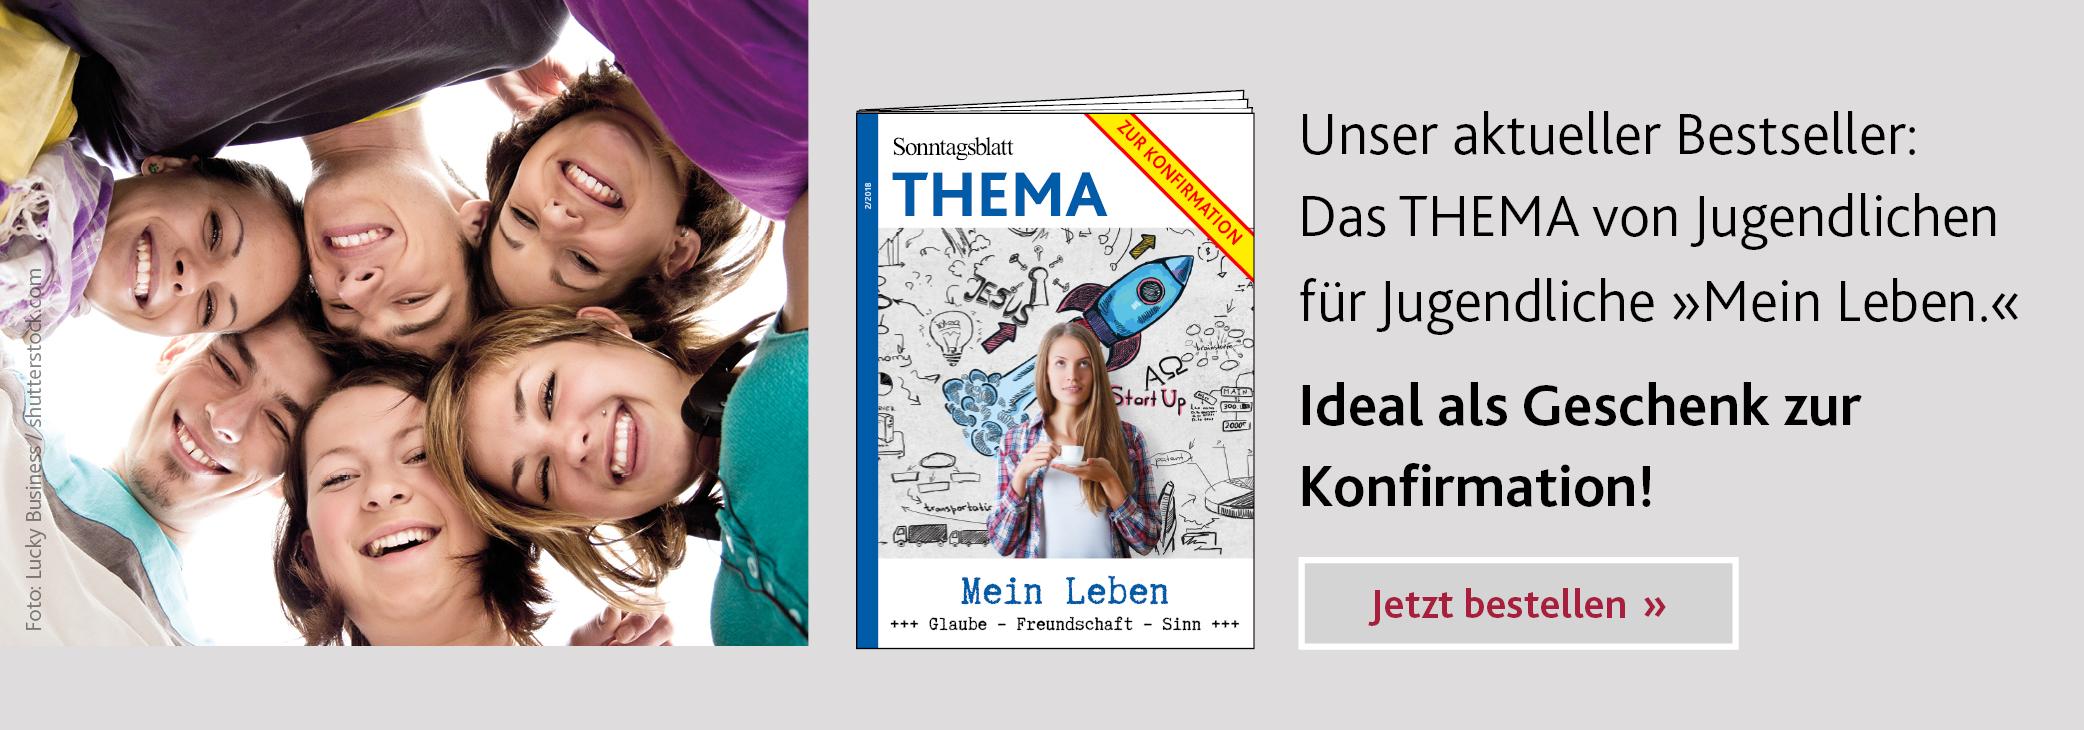 THEMA-Magazin Mein Leben. Glaube, Freundschaft, Sinn